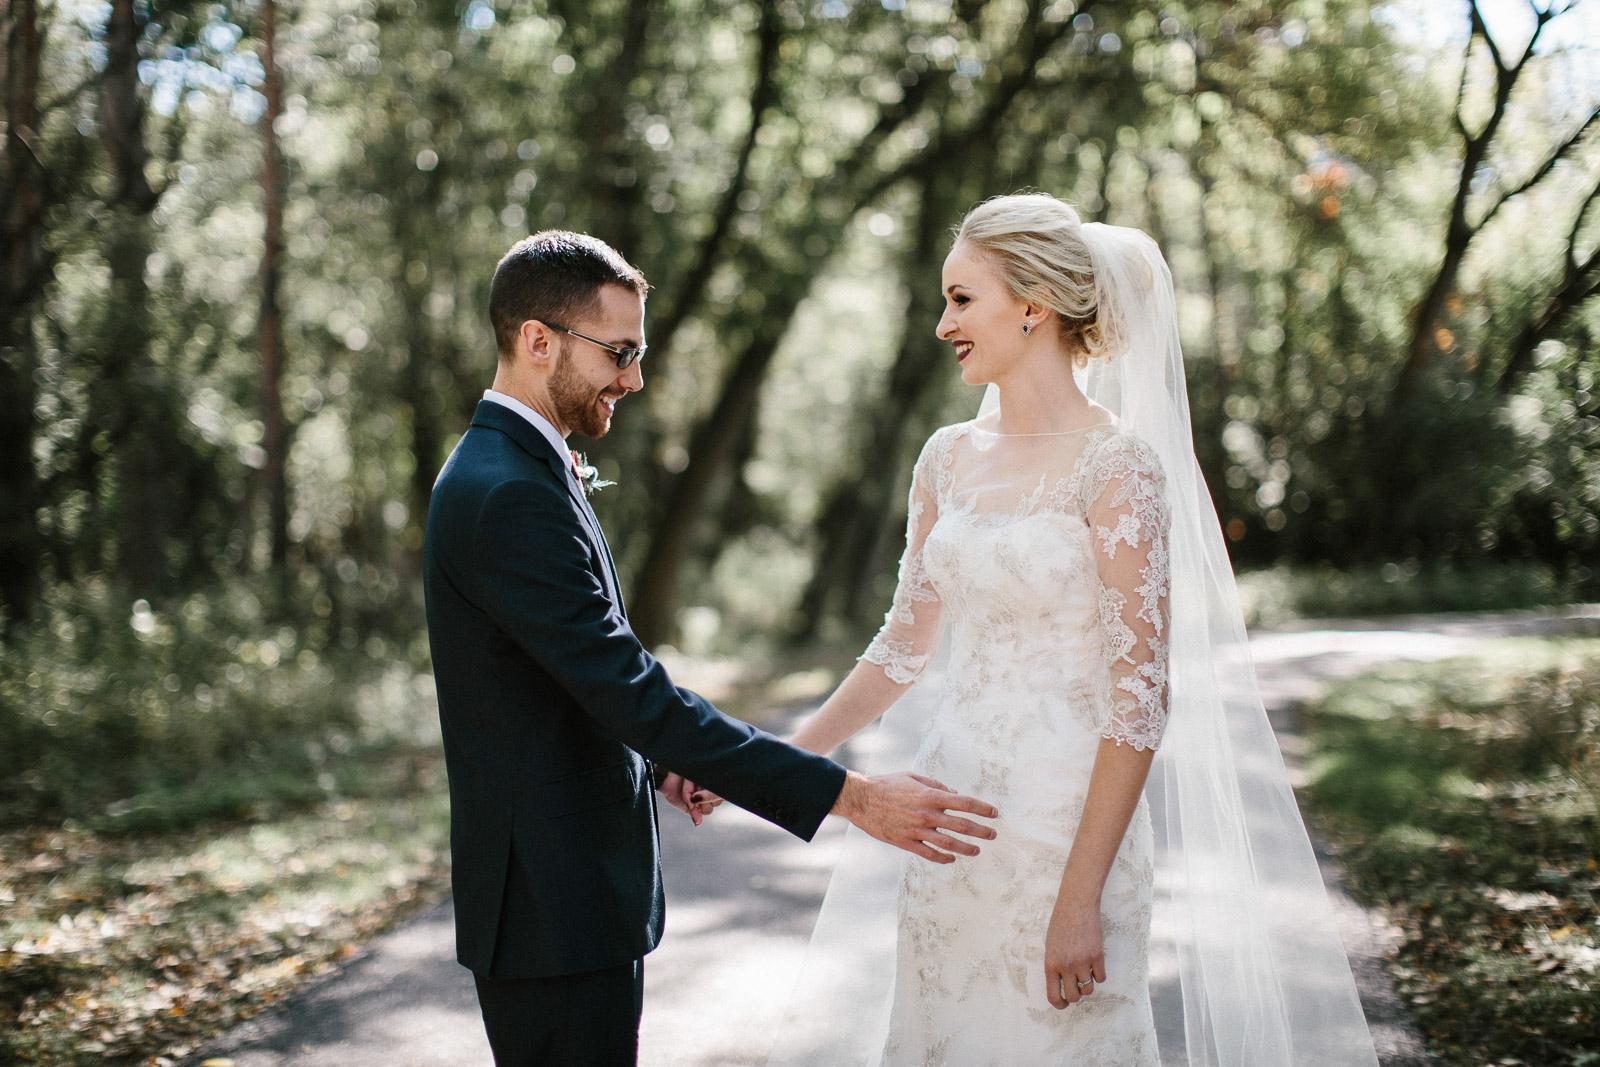 Jenna&Austin_SiouxFalls_Wedding_Photographer_036.jpg